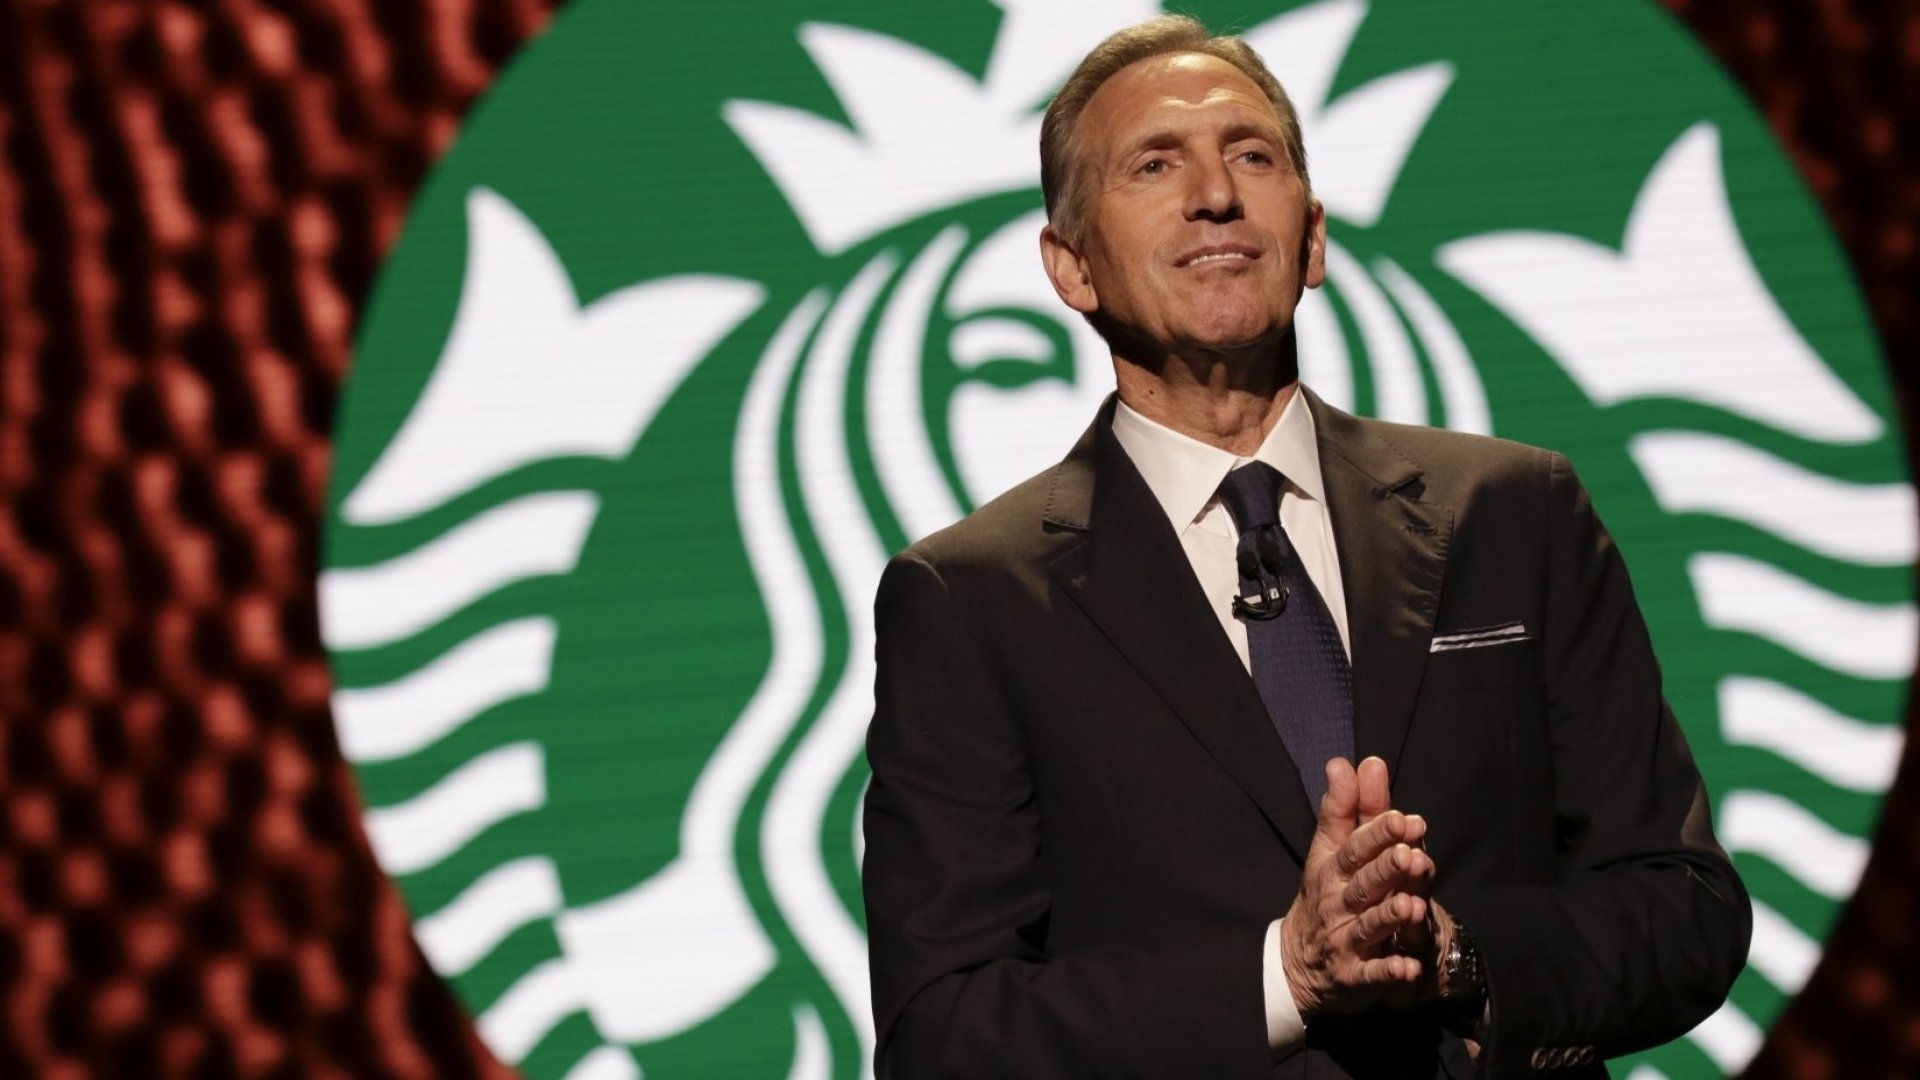 Inspiring Story Of Howard Schultz: The Man Behind Starbucks